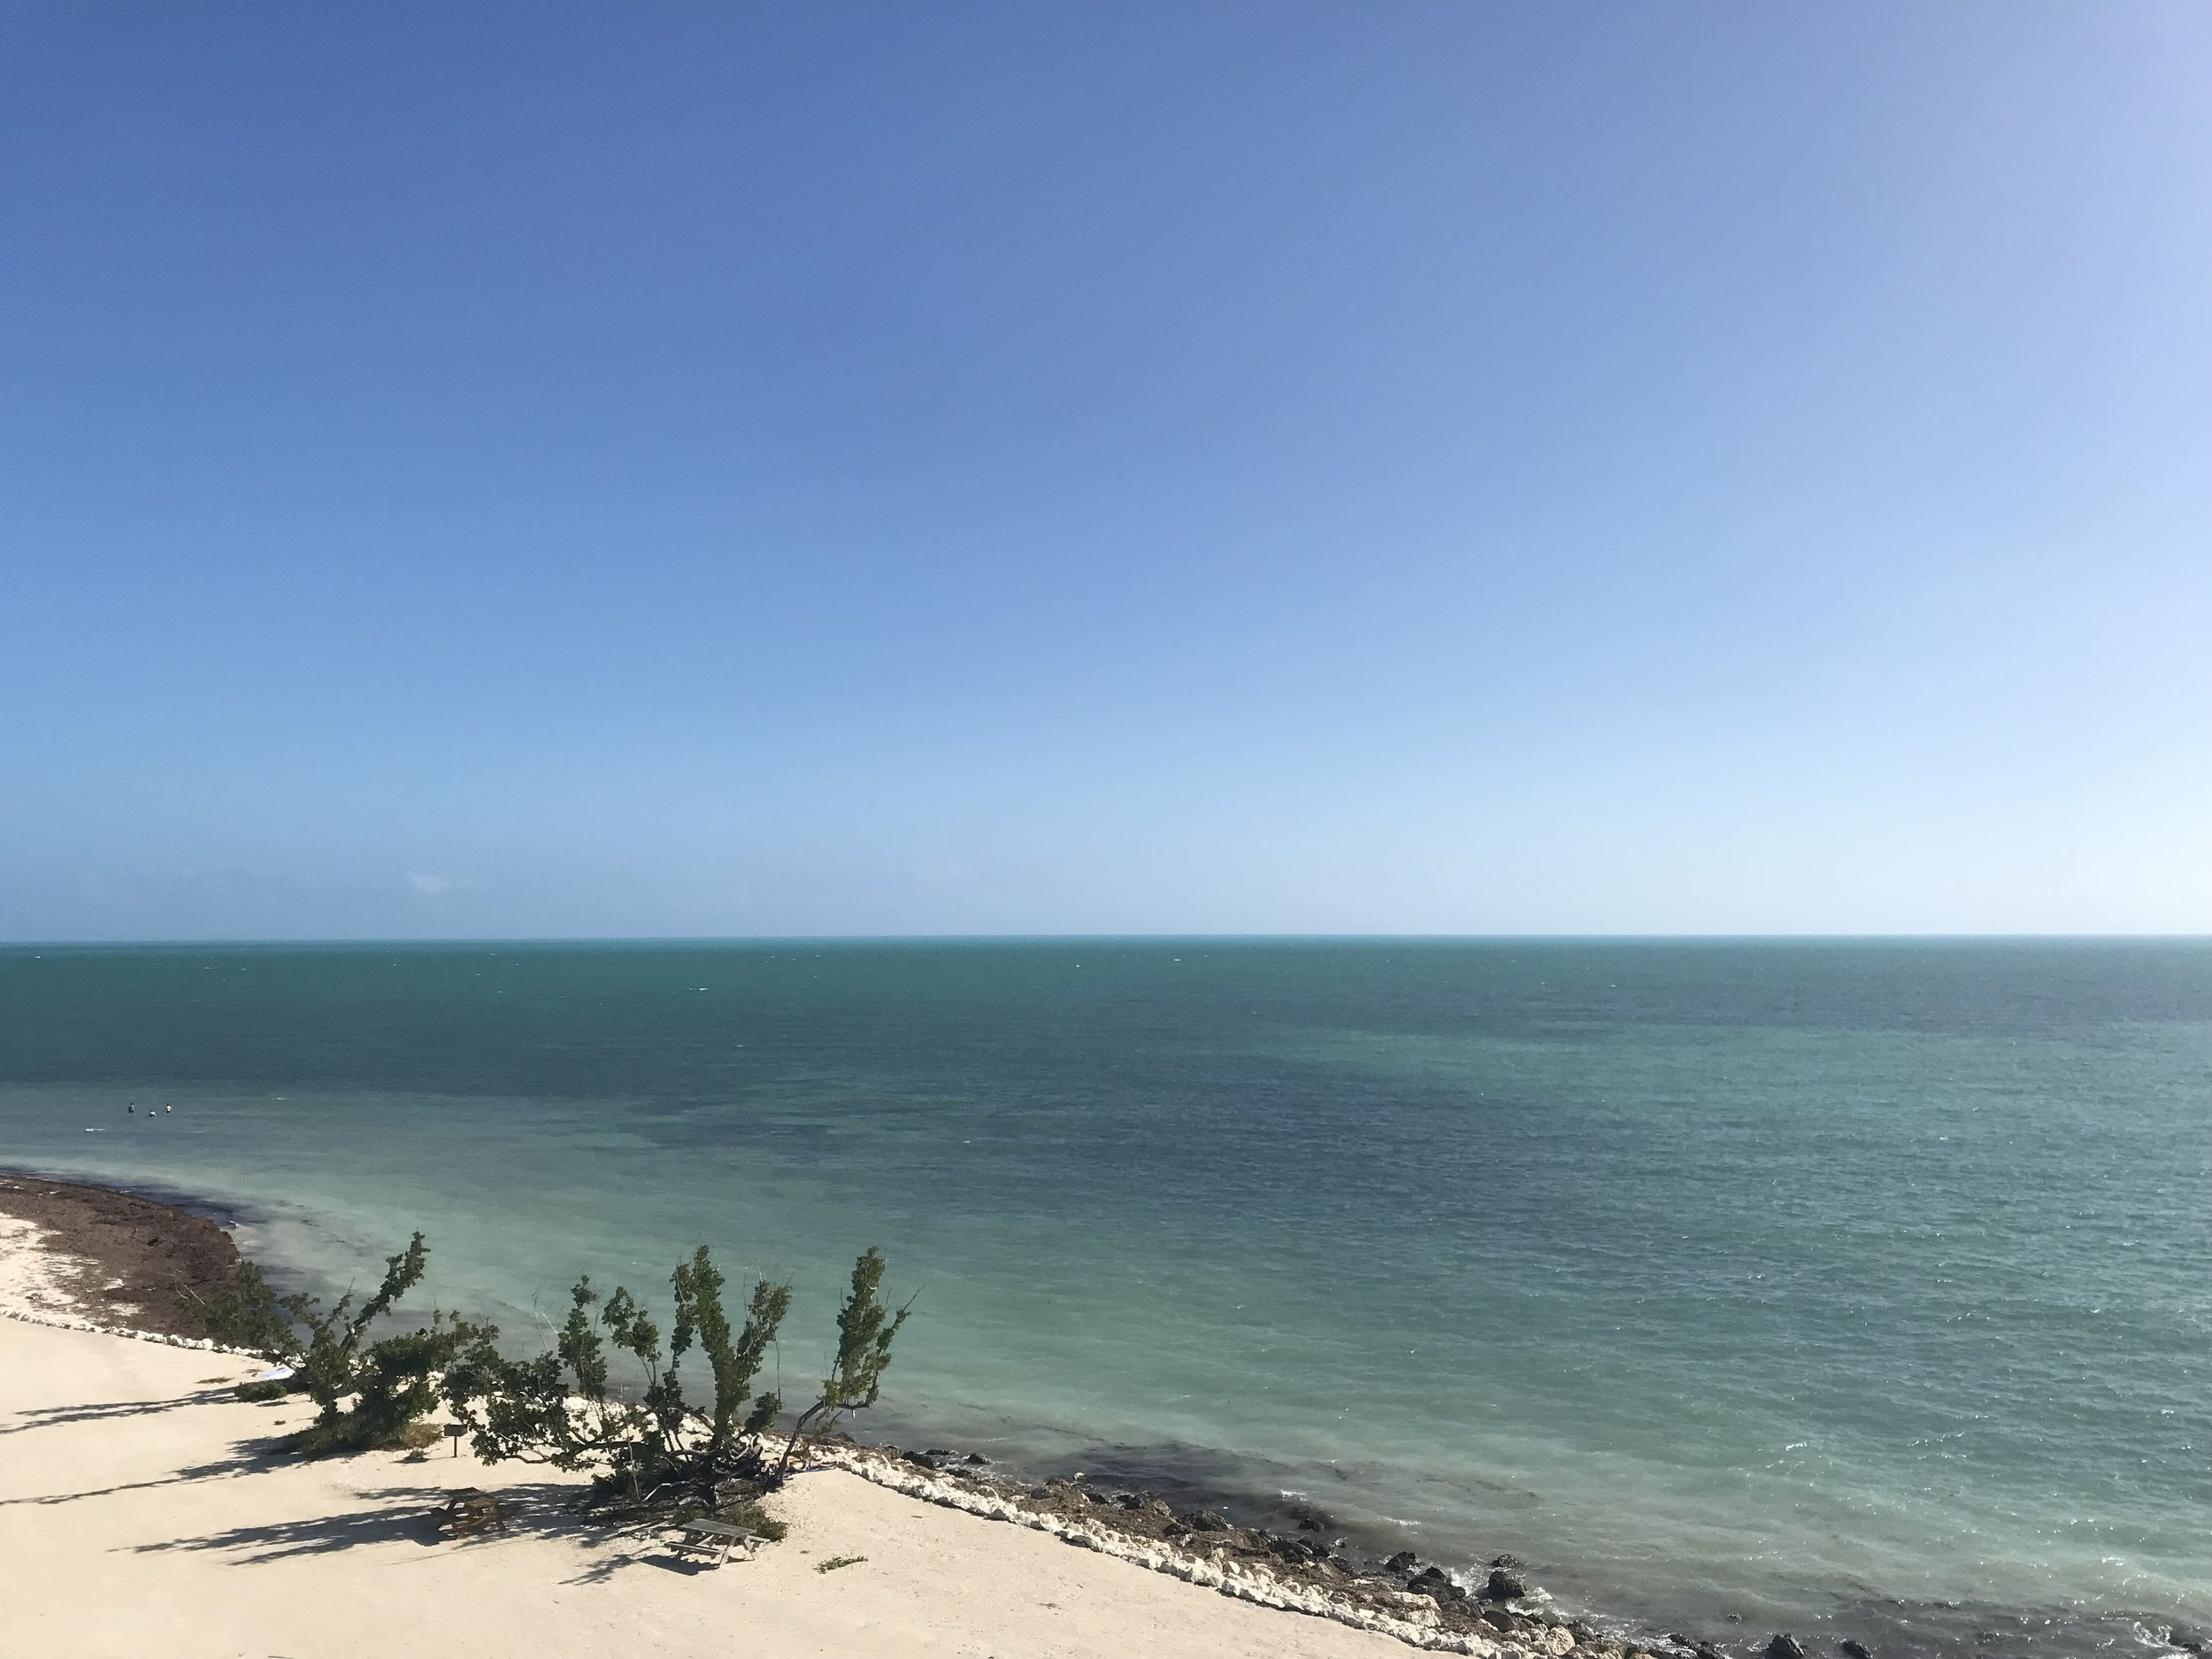 Florida Keys_Bahia Honda State Park_Credit_JenniferMerrick (2).JPG